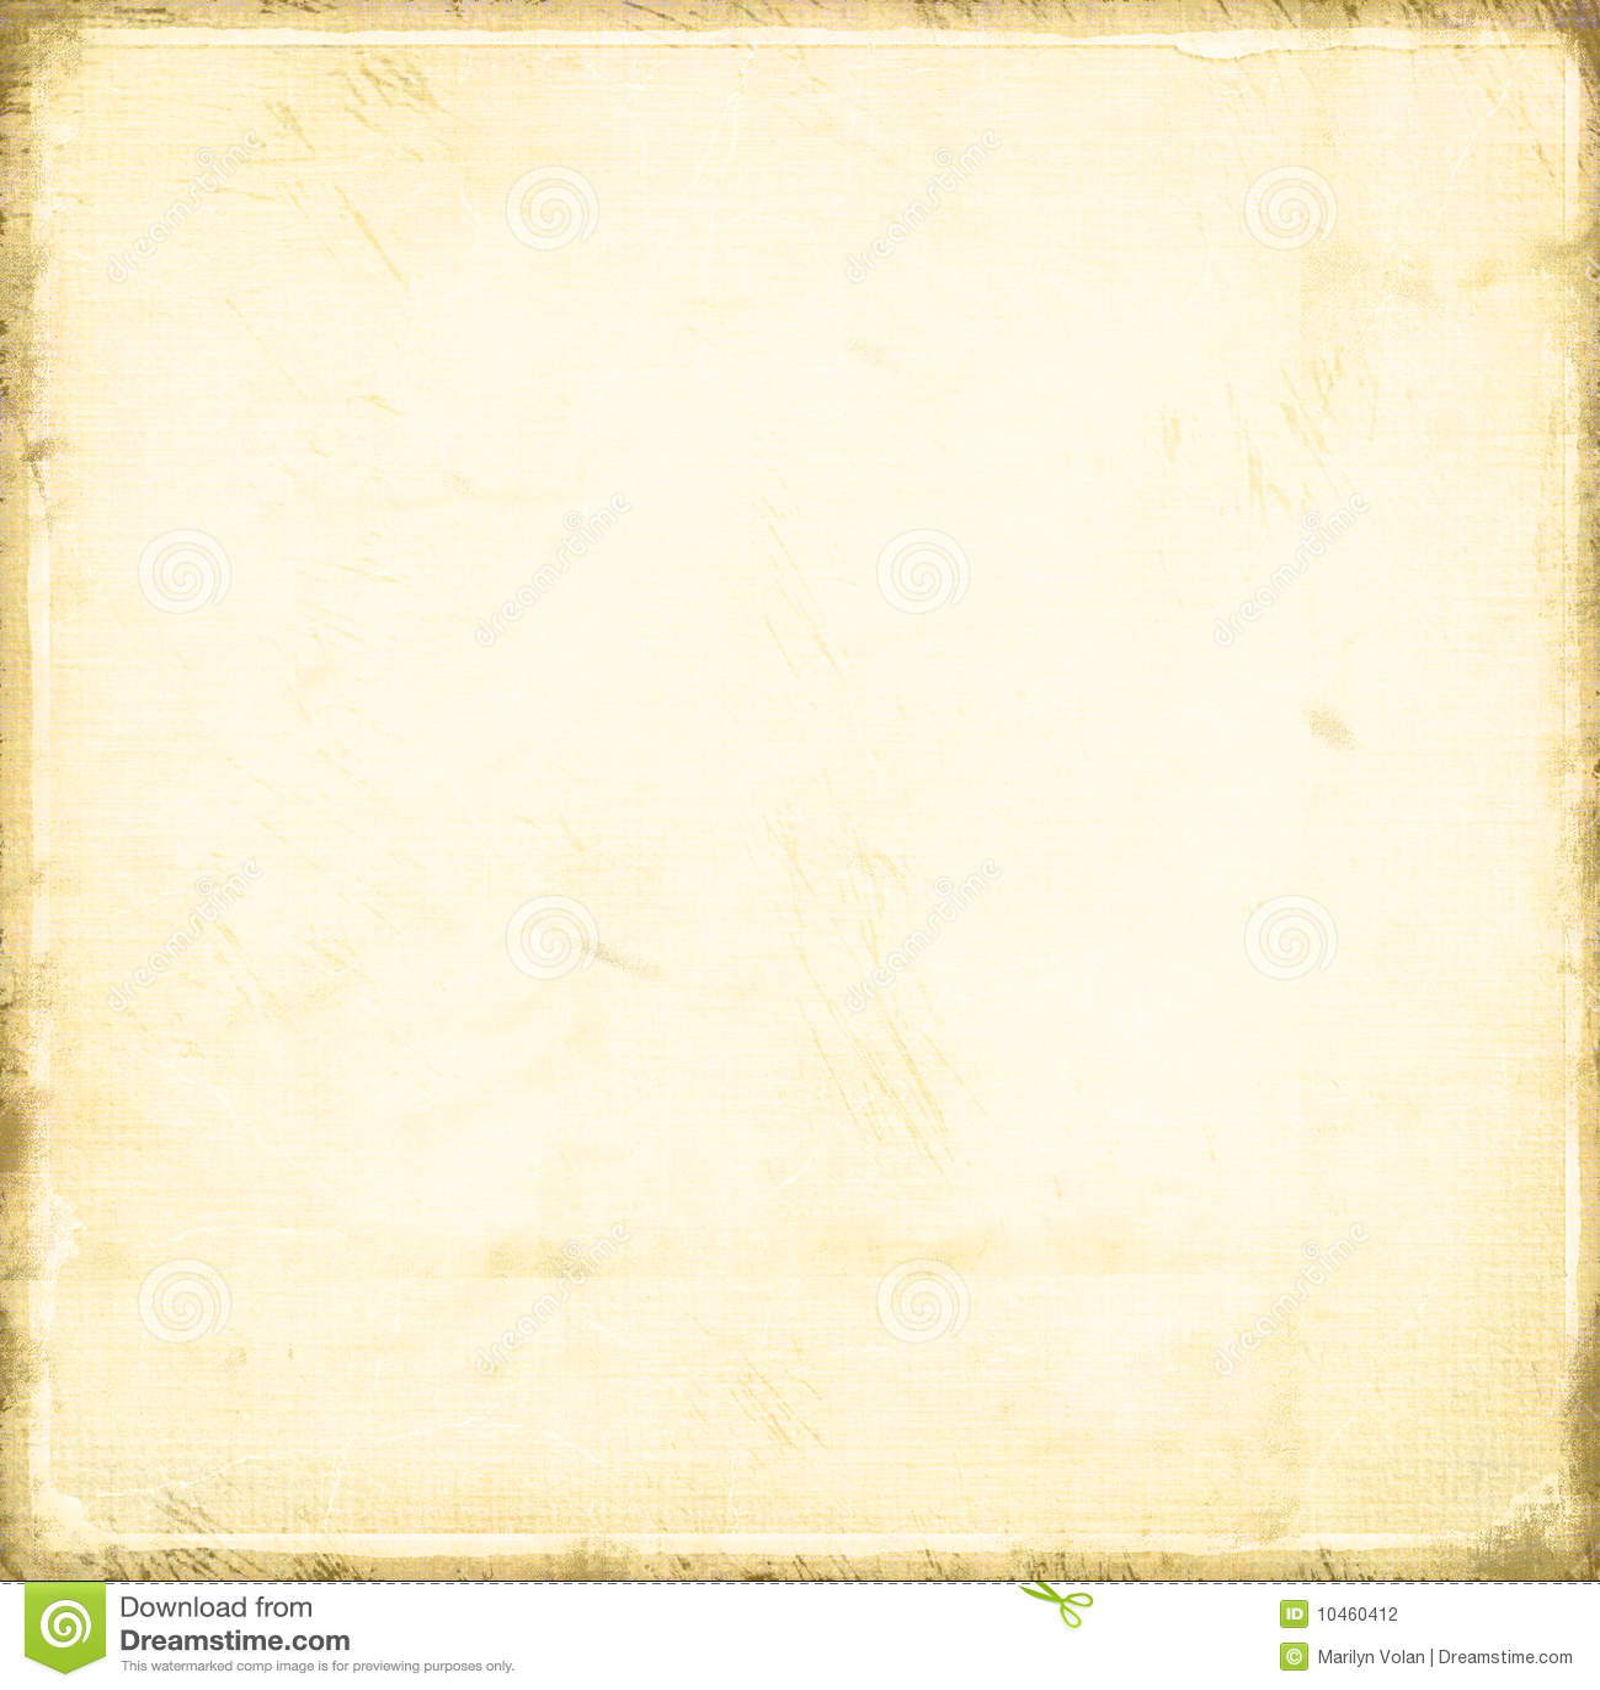 Old Light Paper Stock Photography - Image: 10460412   1300 x 1390 jpeg 139kB